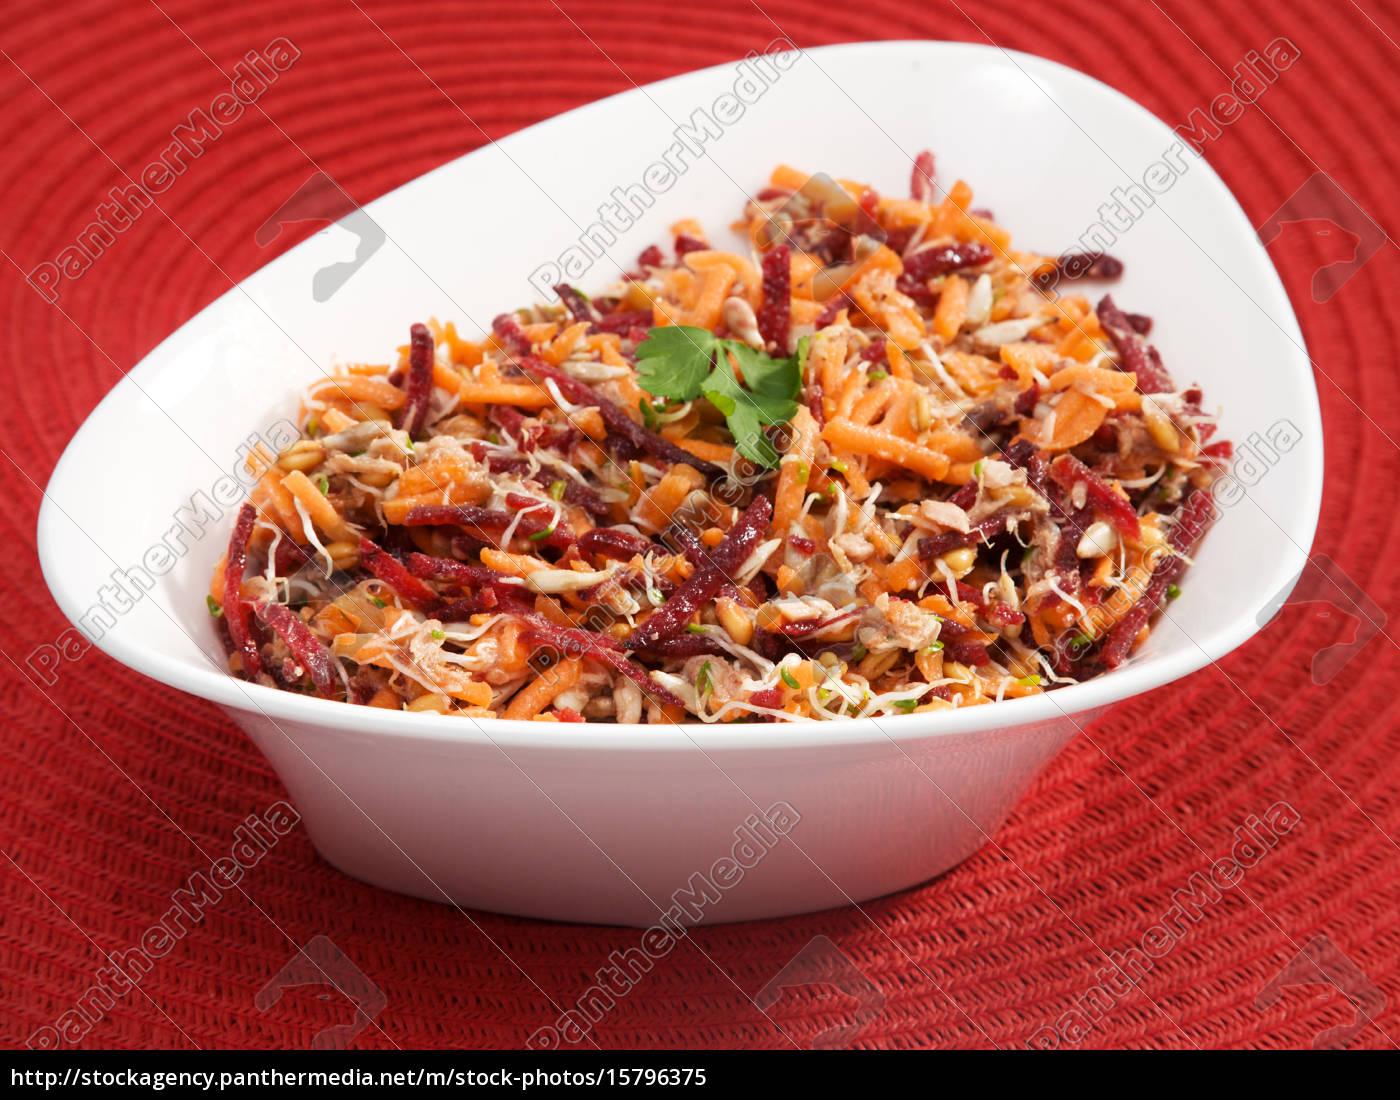 carrot, , beetroot, , tuna, fish, salad, carrot, , beetroot, - 15796375